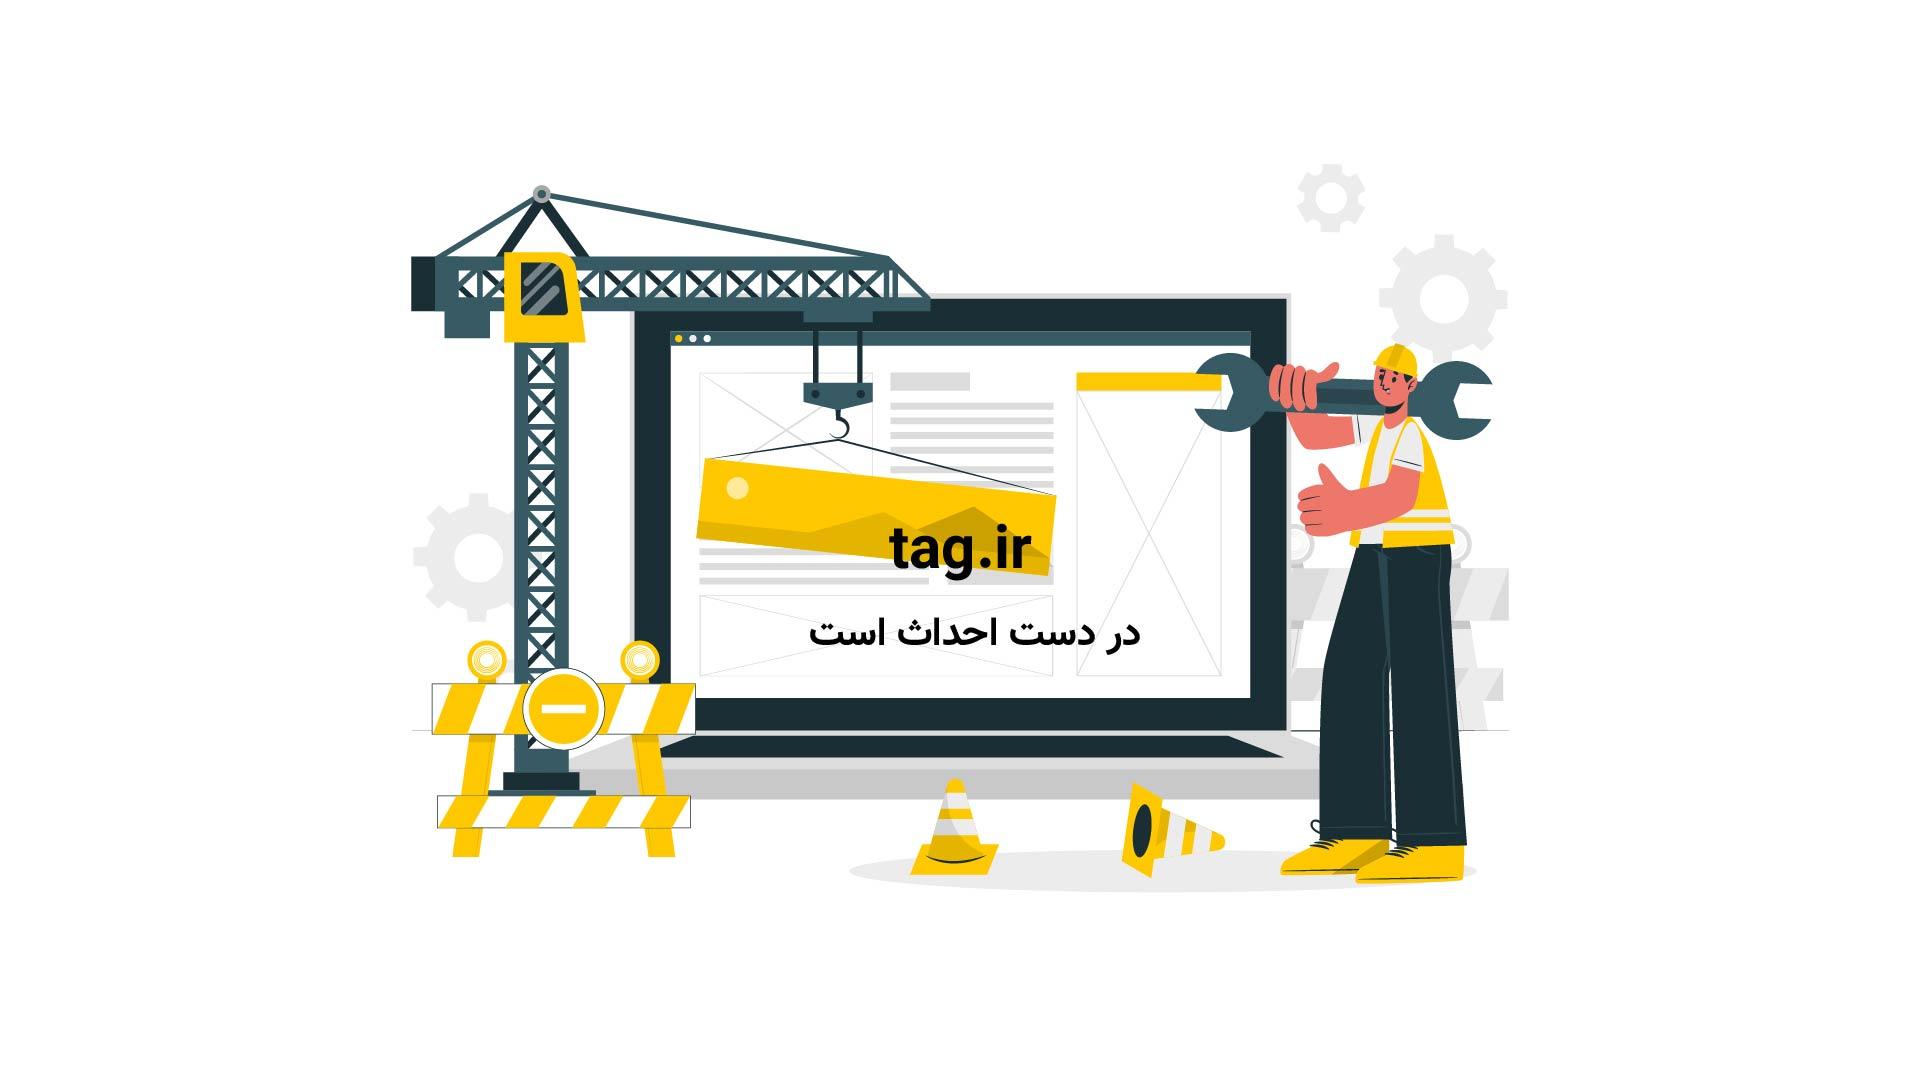 کیک کاراملی شکلات | تگ